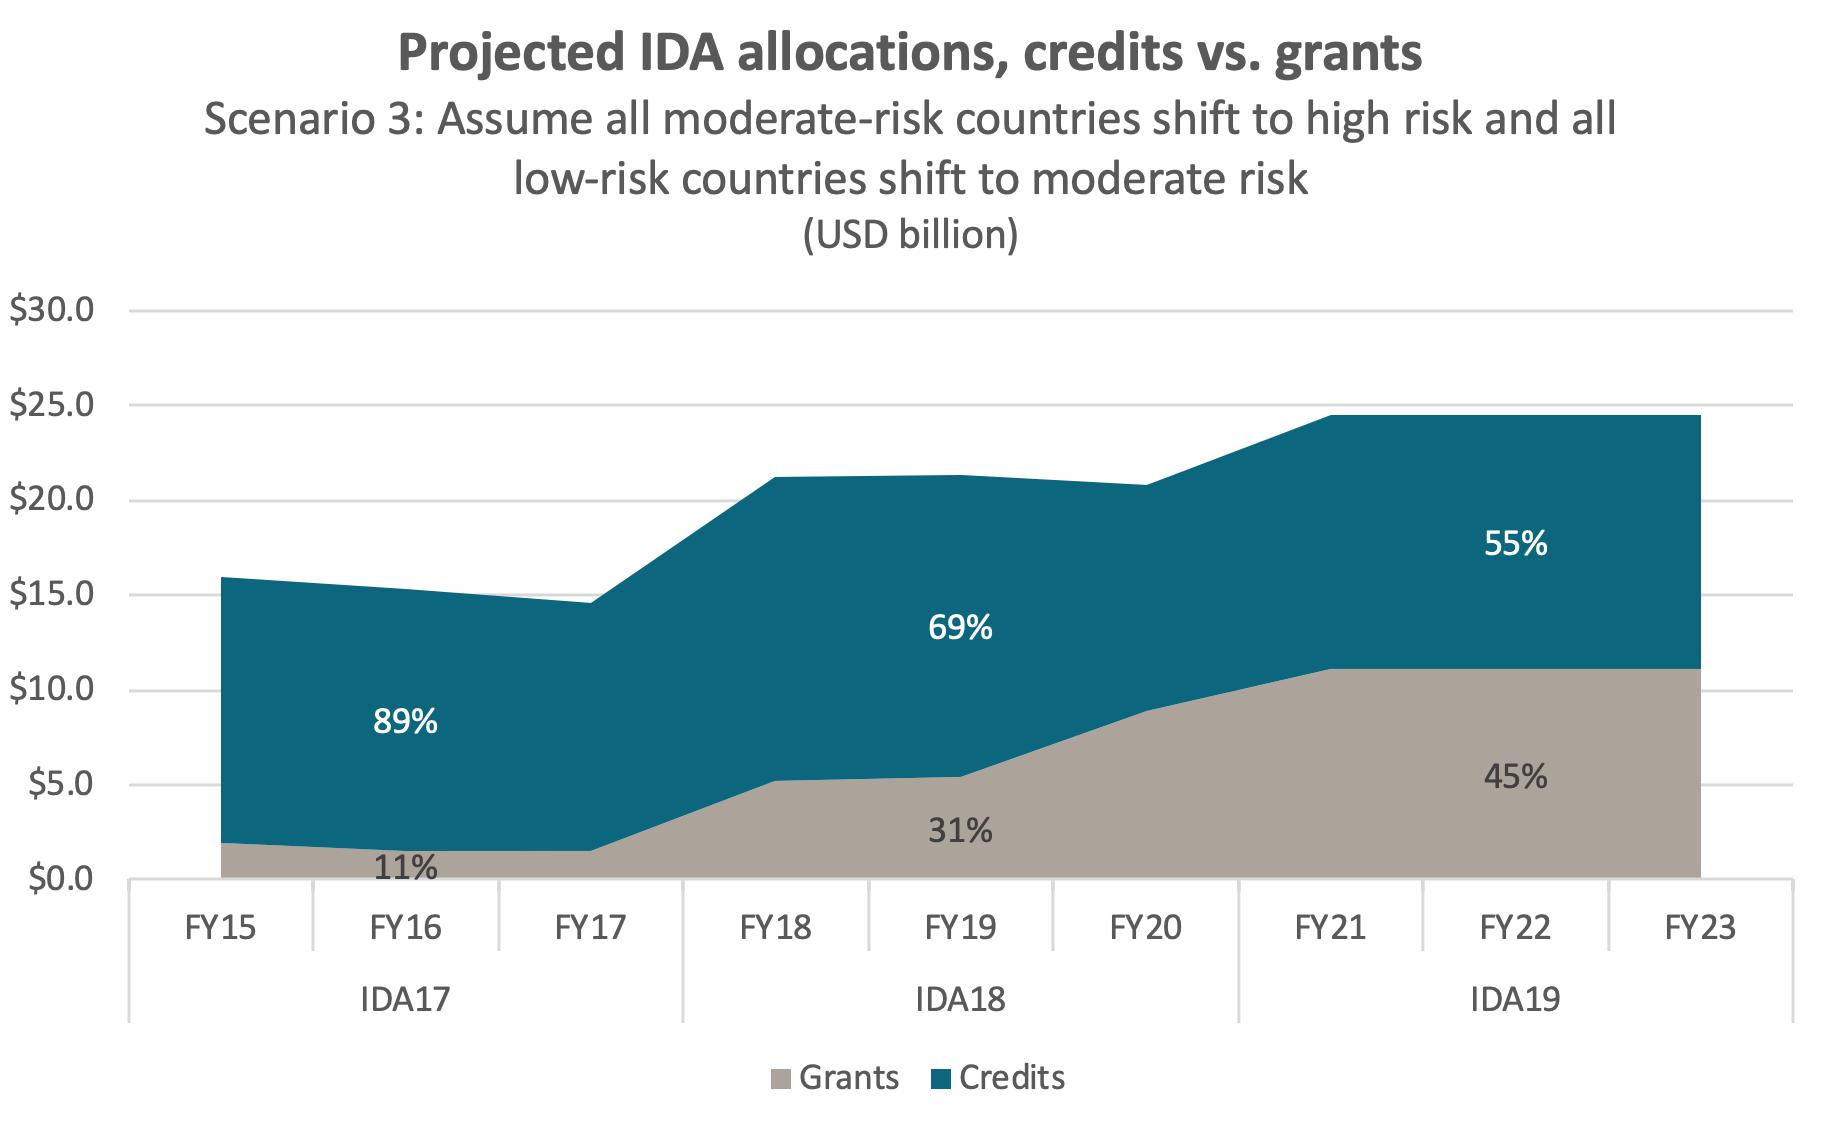 Projected IDA allocations under scenario 3, with grants rising to 45%